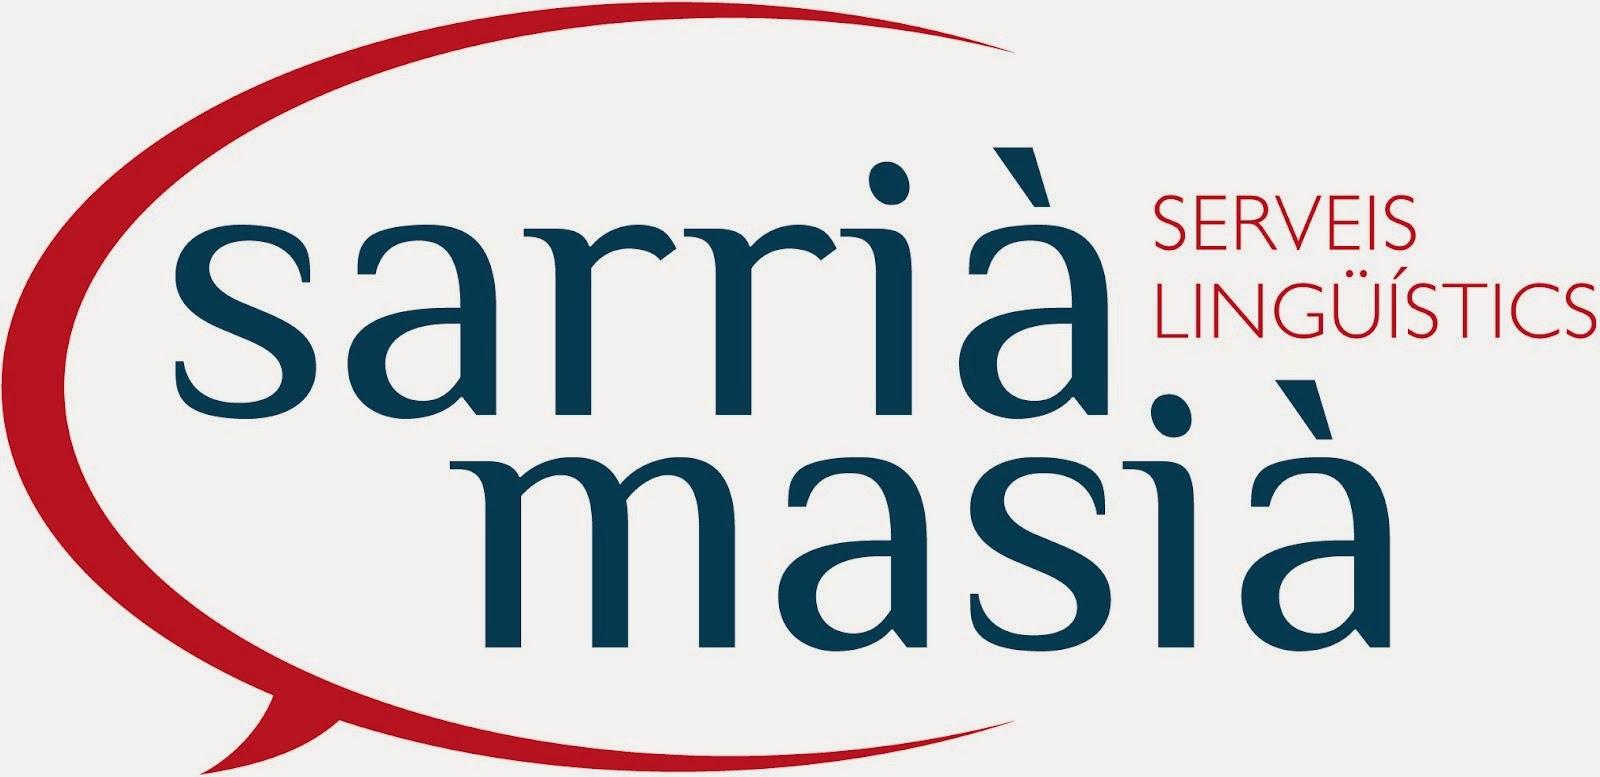 Sarrià Masià Serveis Lingüístics